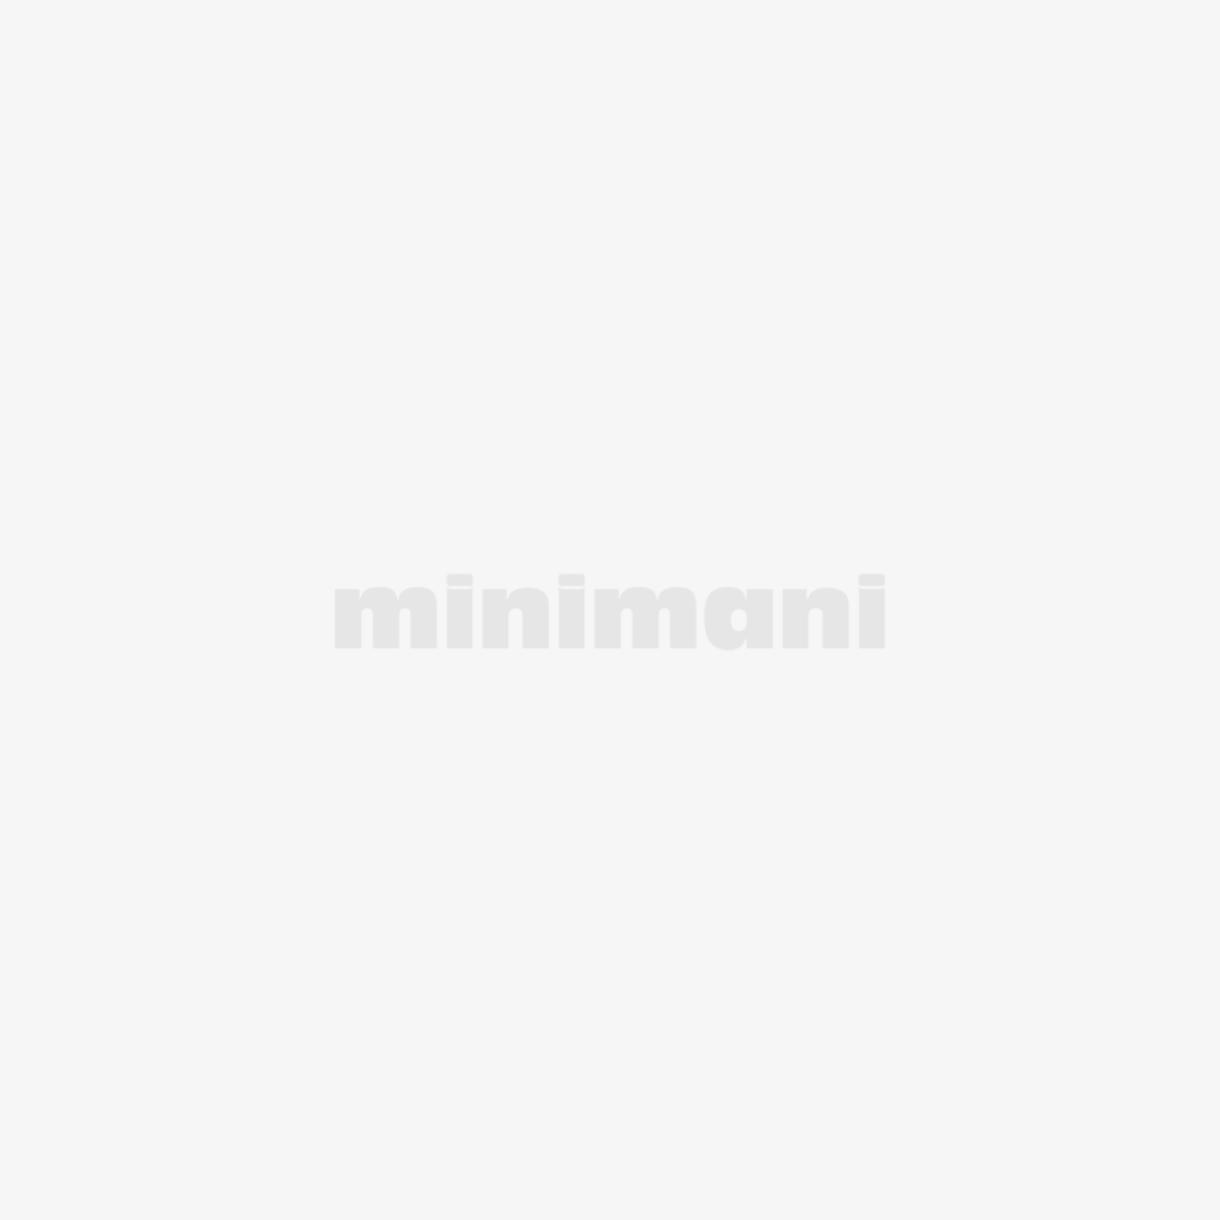 M-FILTER ILMANSUODATIN  MAP 6870 VOLVO 440 460 480 I